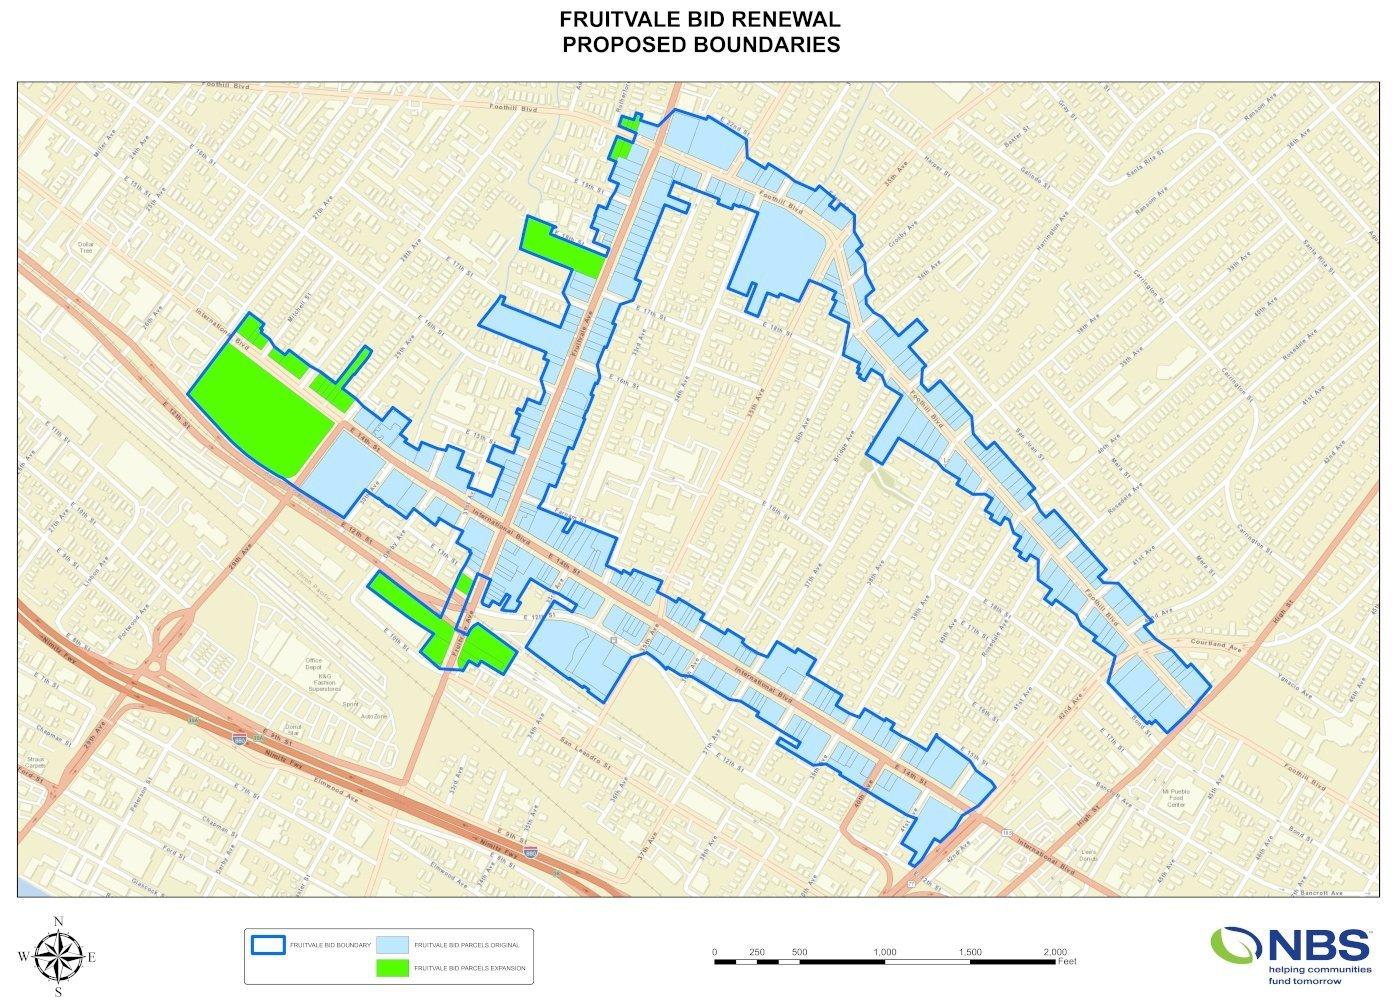 Proposed Fruitvale BID Boundaries